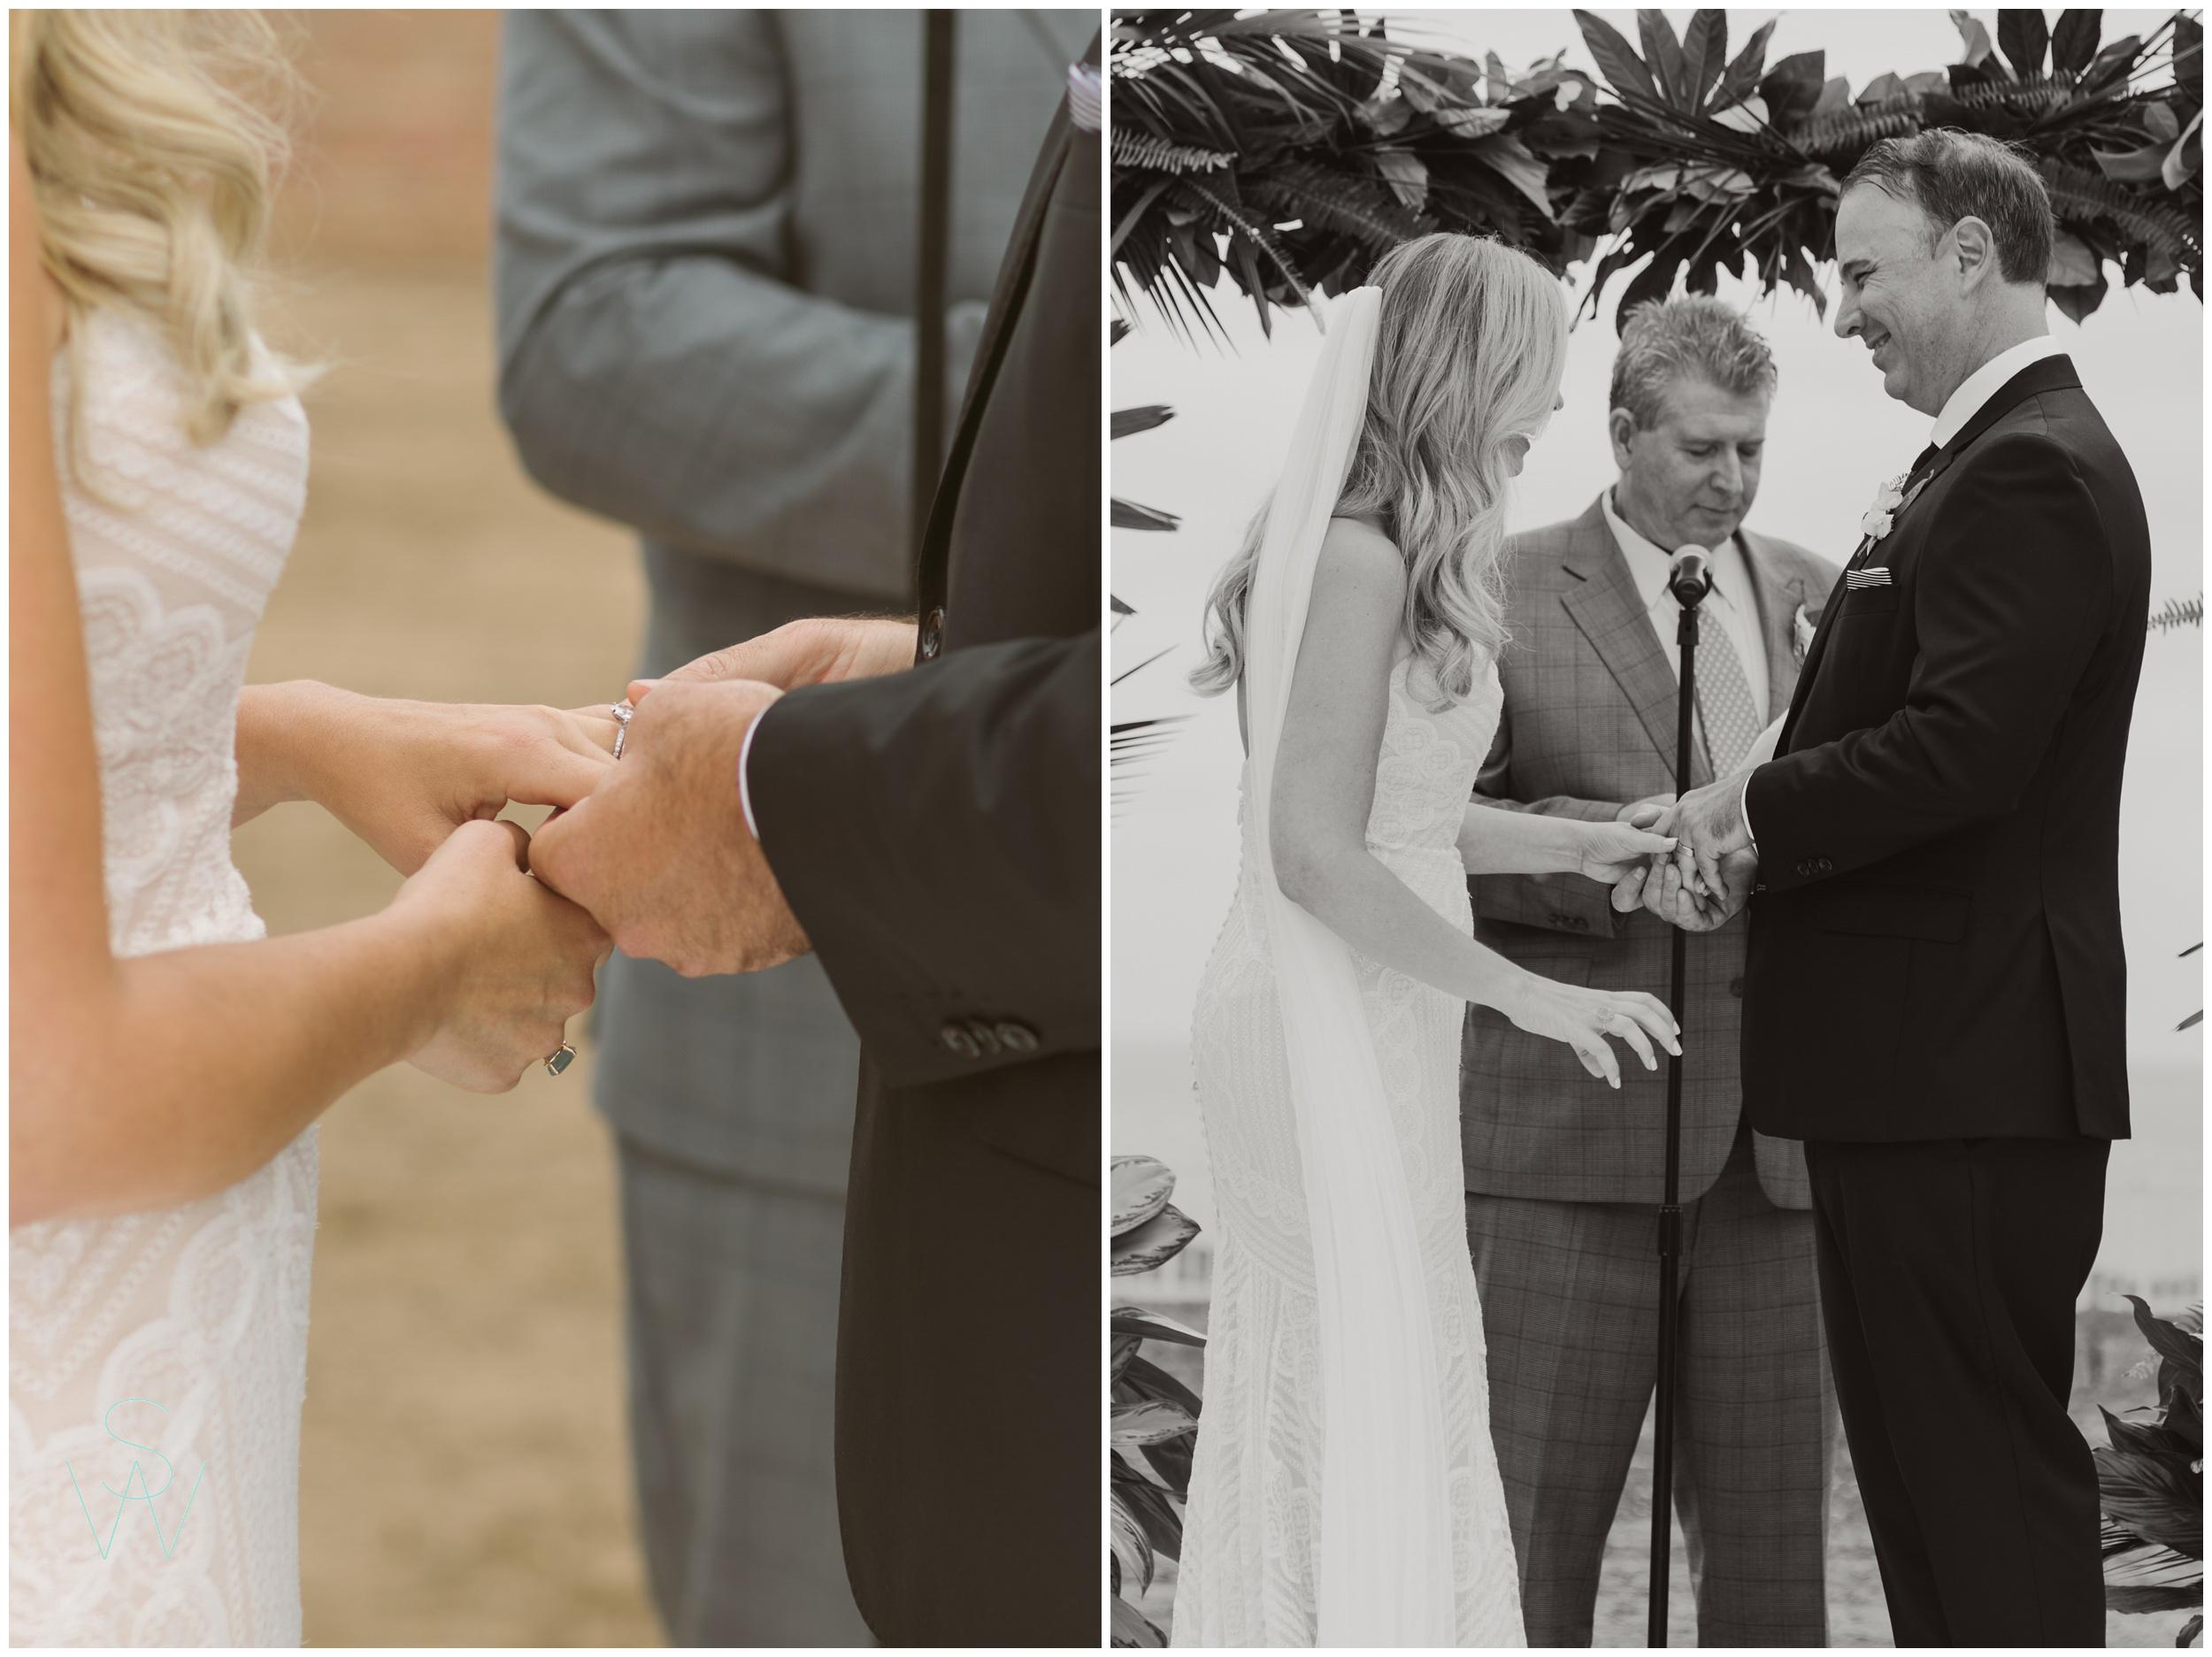 shewanders.san.diego.wedding.brigatine.isari-132.jpg